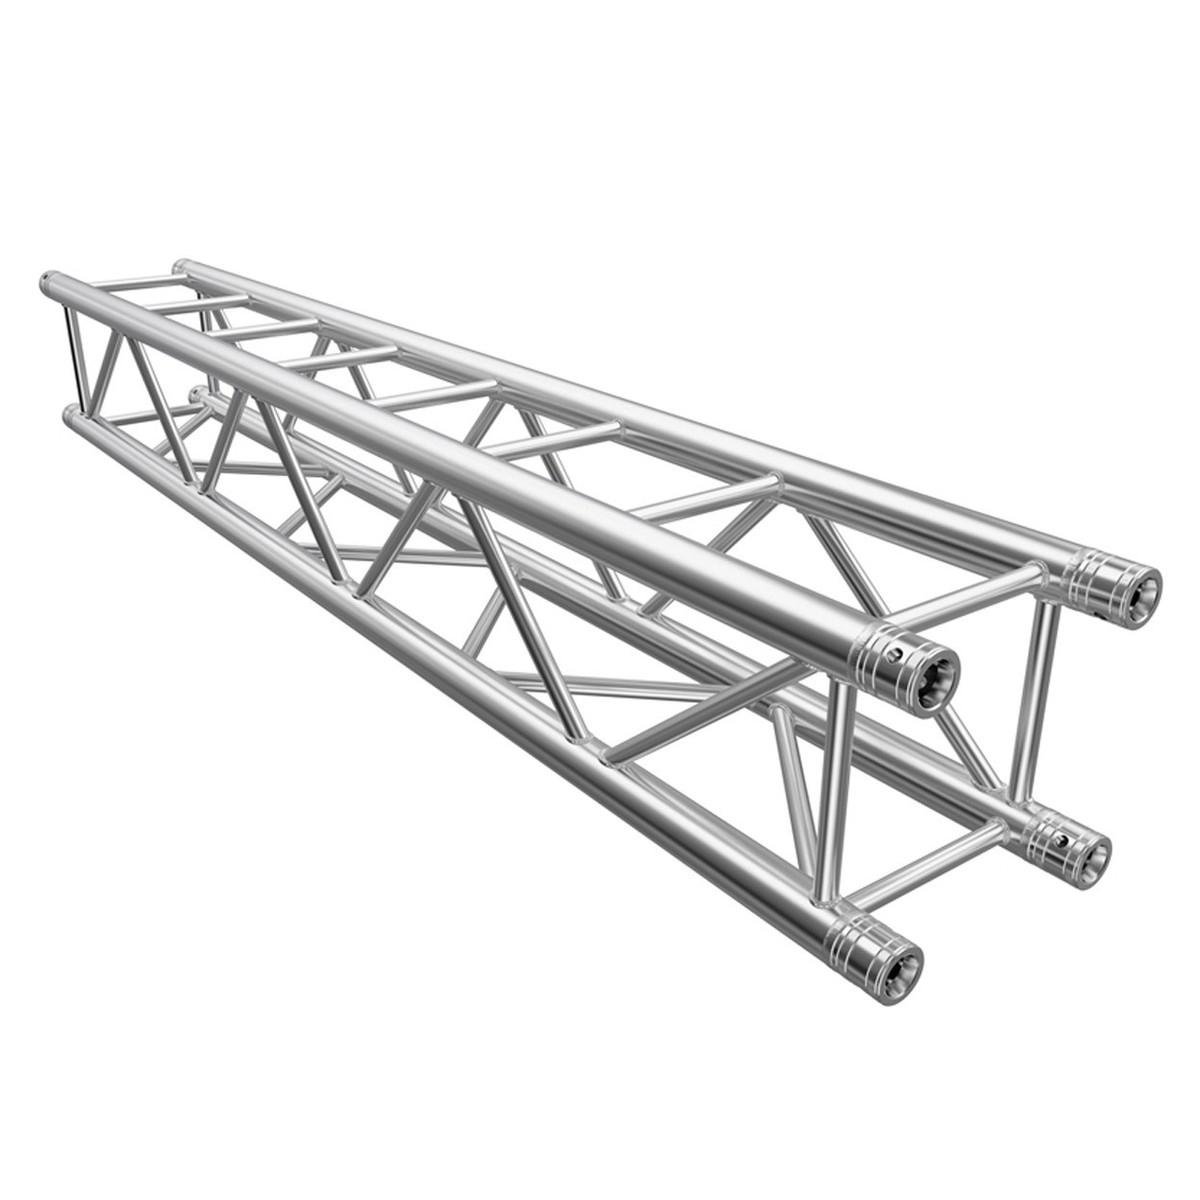 global truss f34200 f34 standard truss 2m at. Black Bedroom Furniture Sets. Home Design Ideas